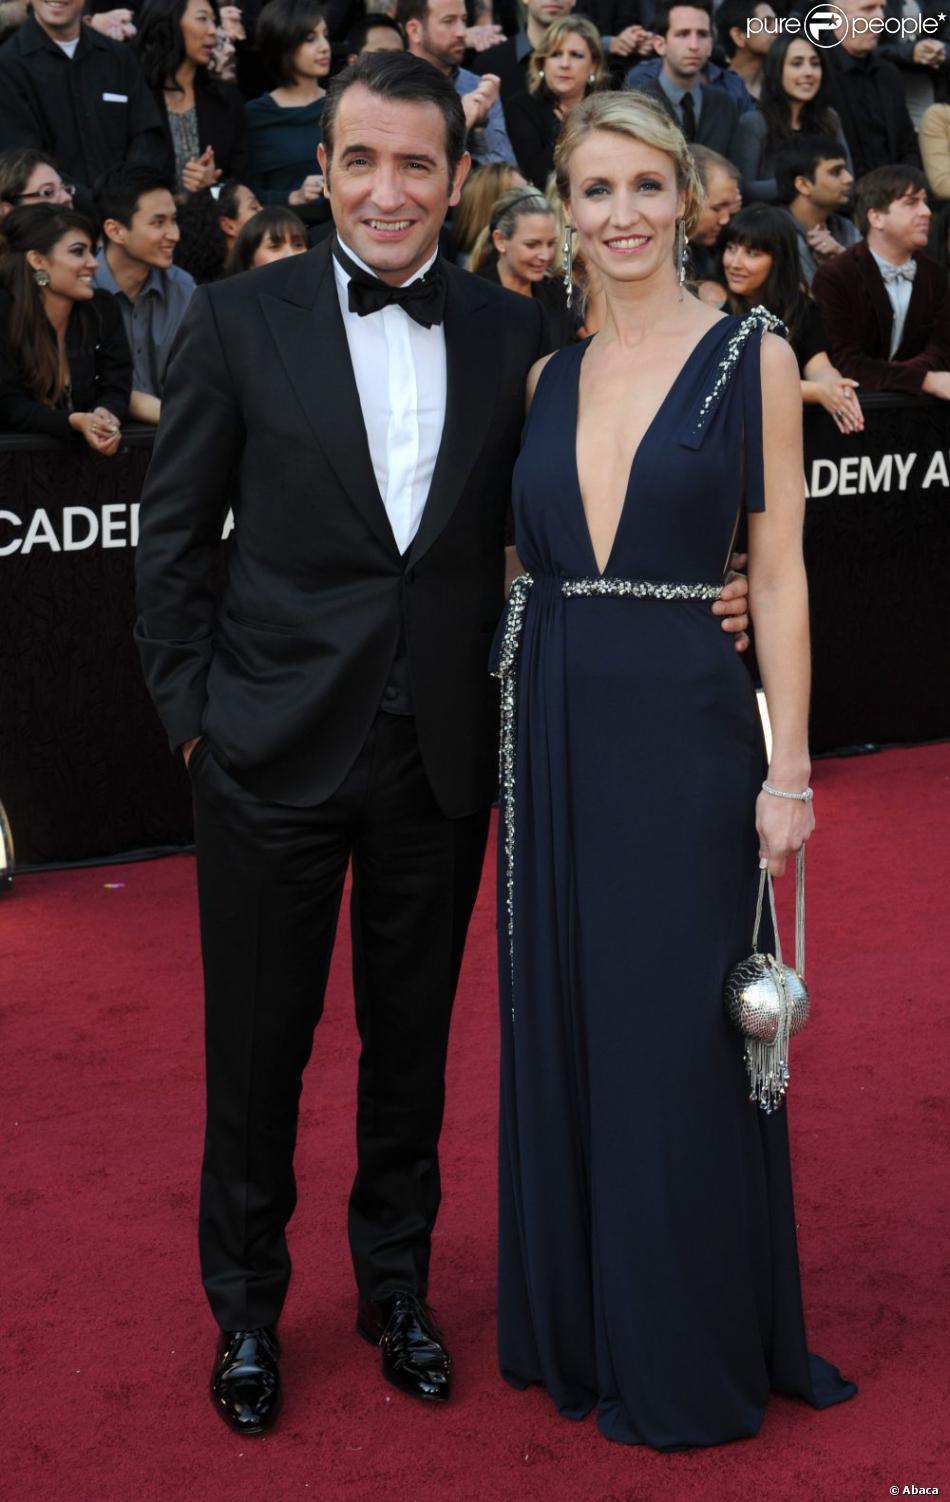 Jean Dujardin et Alexandra Lamy lors des Oscars le 26 février 2012